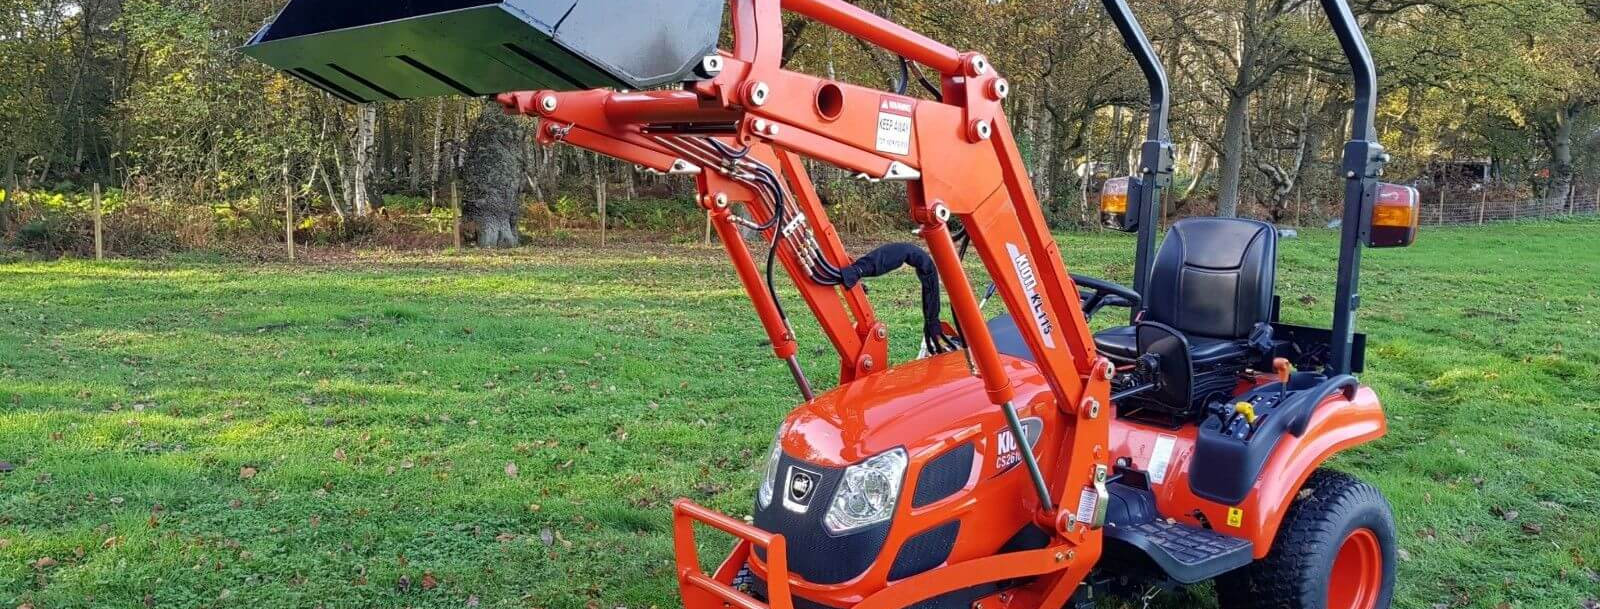 Kioti Tractor CS2610 Front Loader Tractor | Compact Tractors For Sale